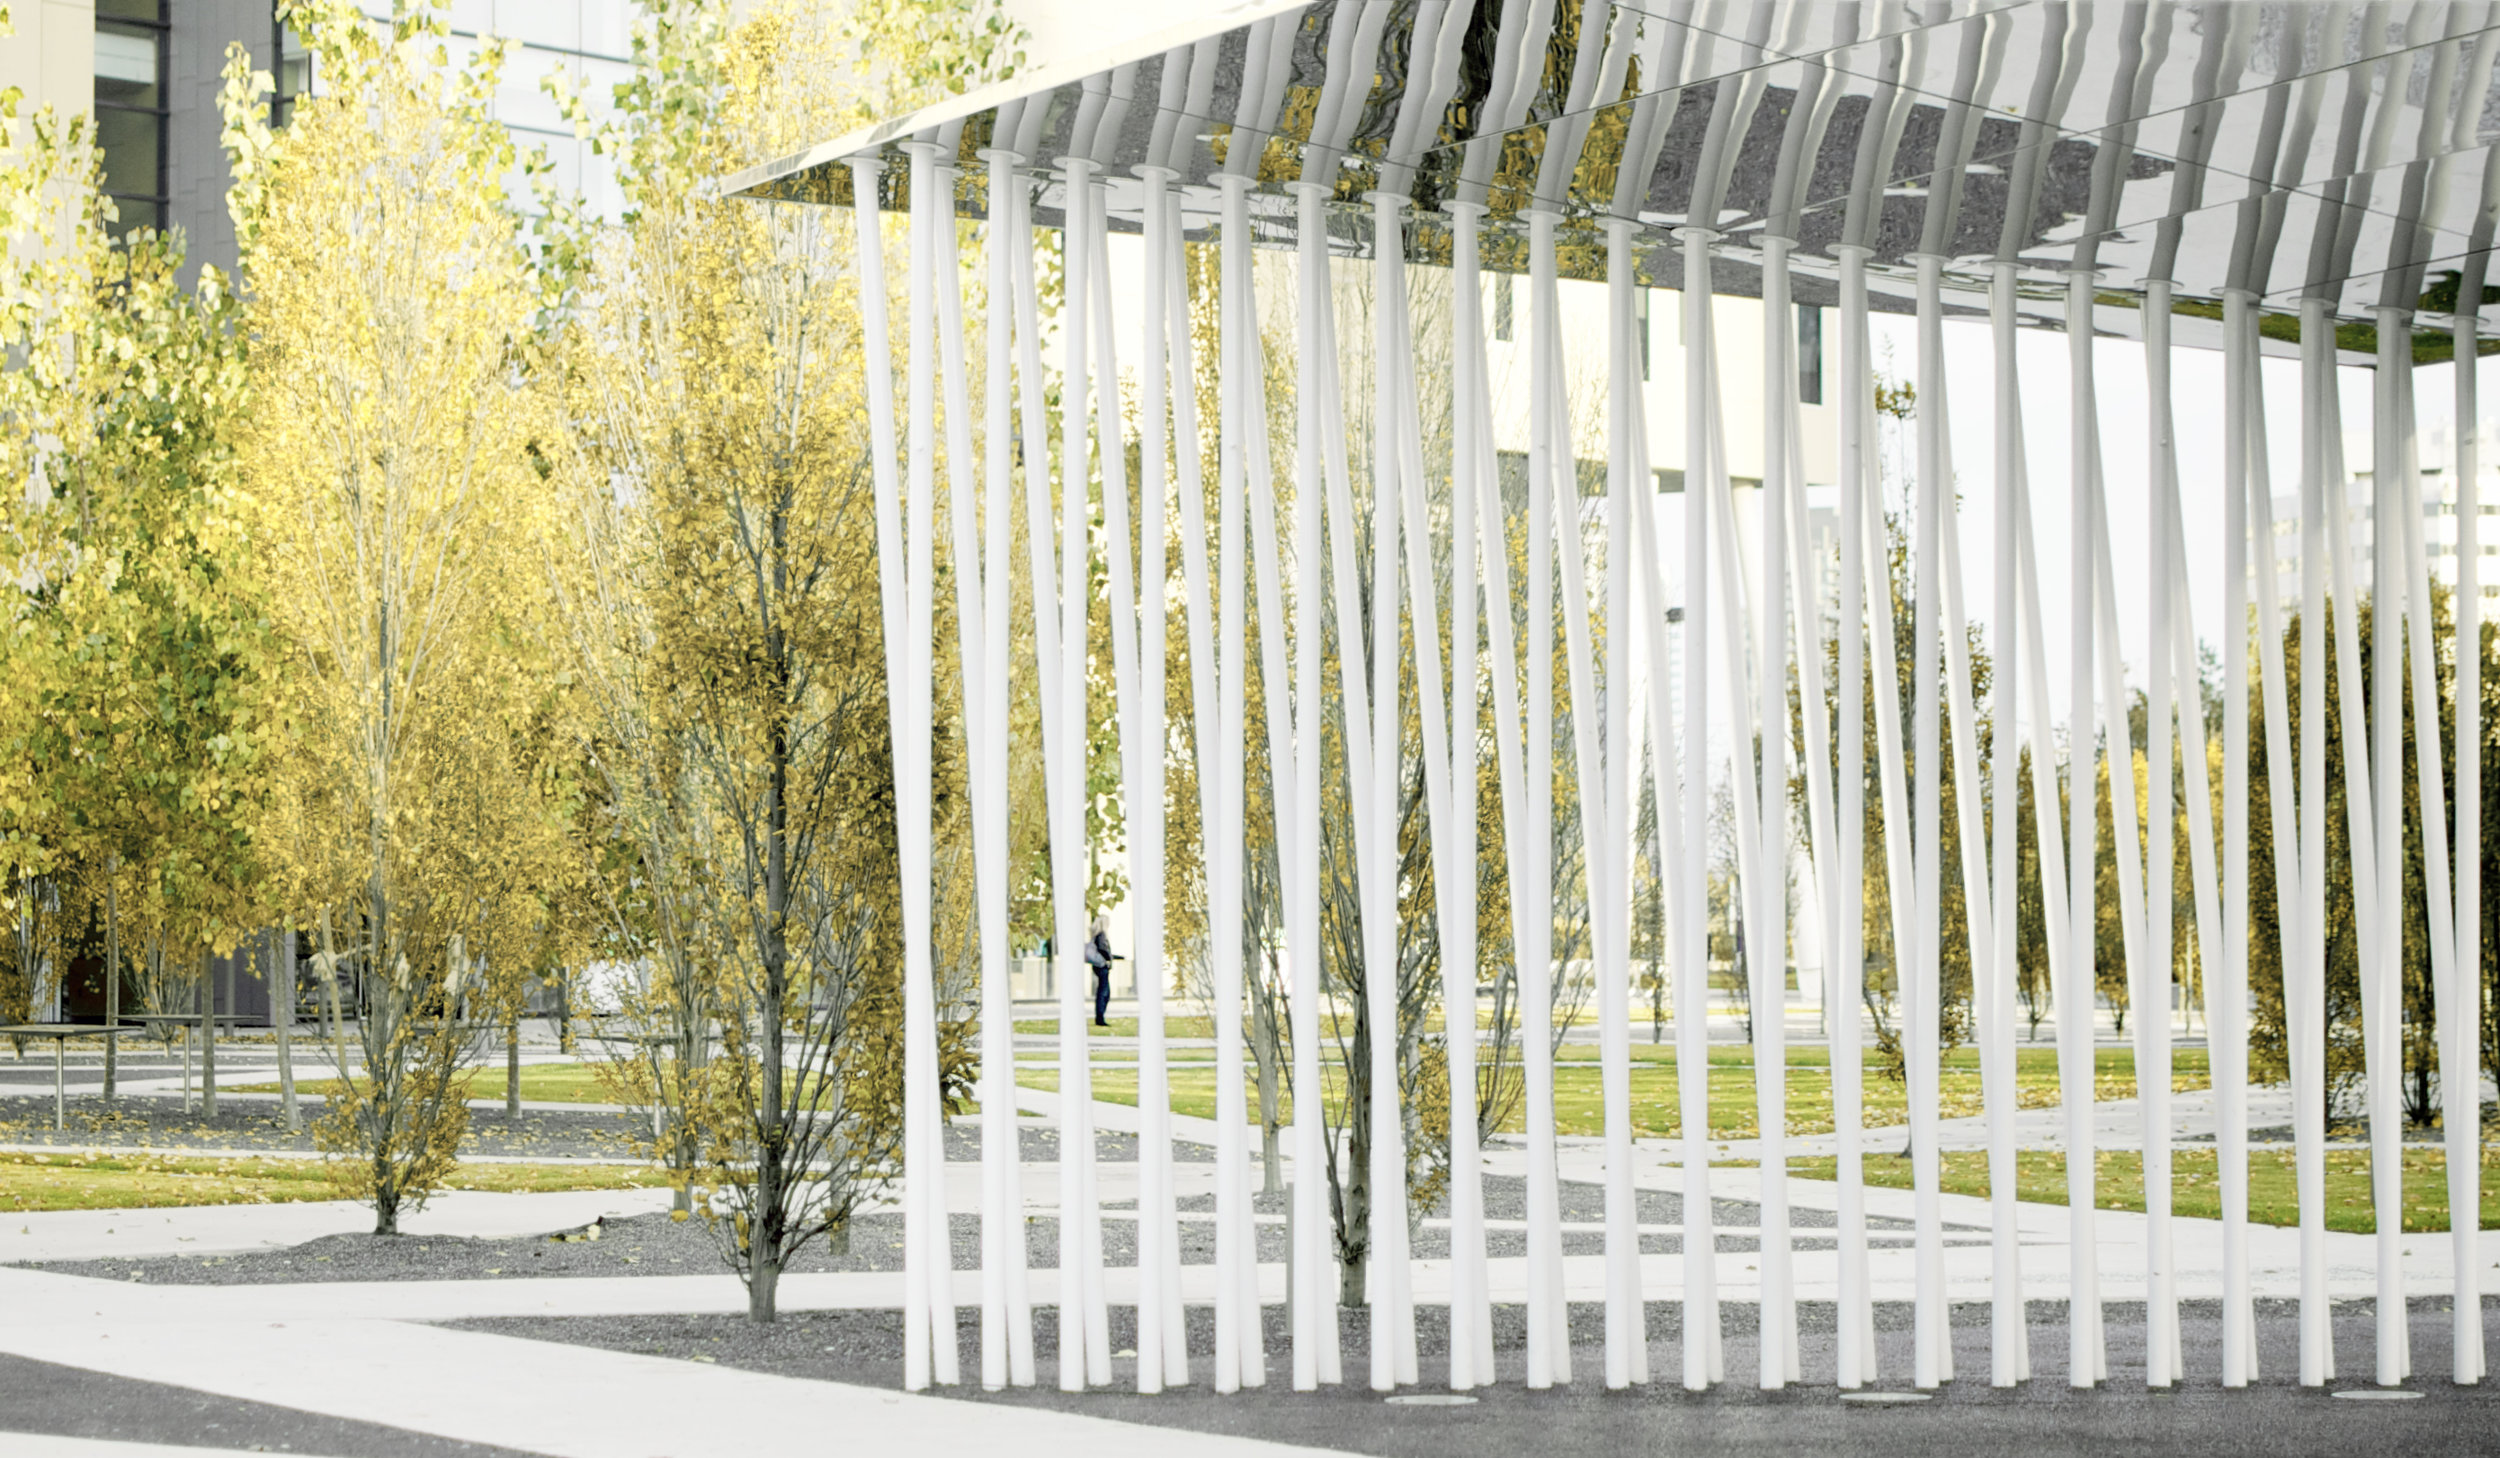 Scholars Green - pavilion trees